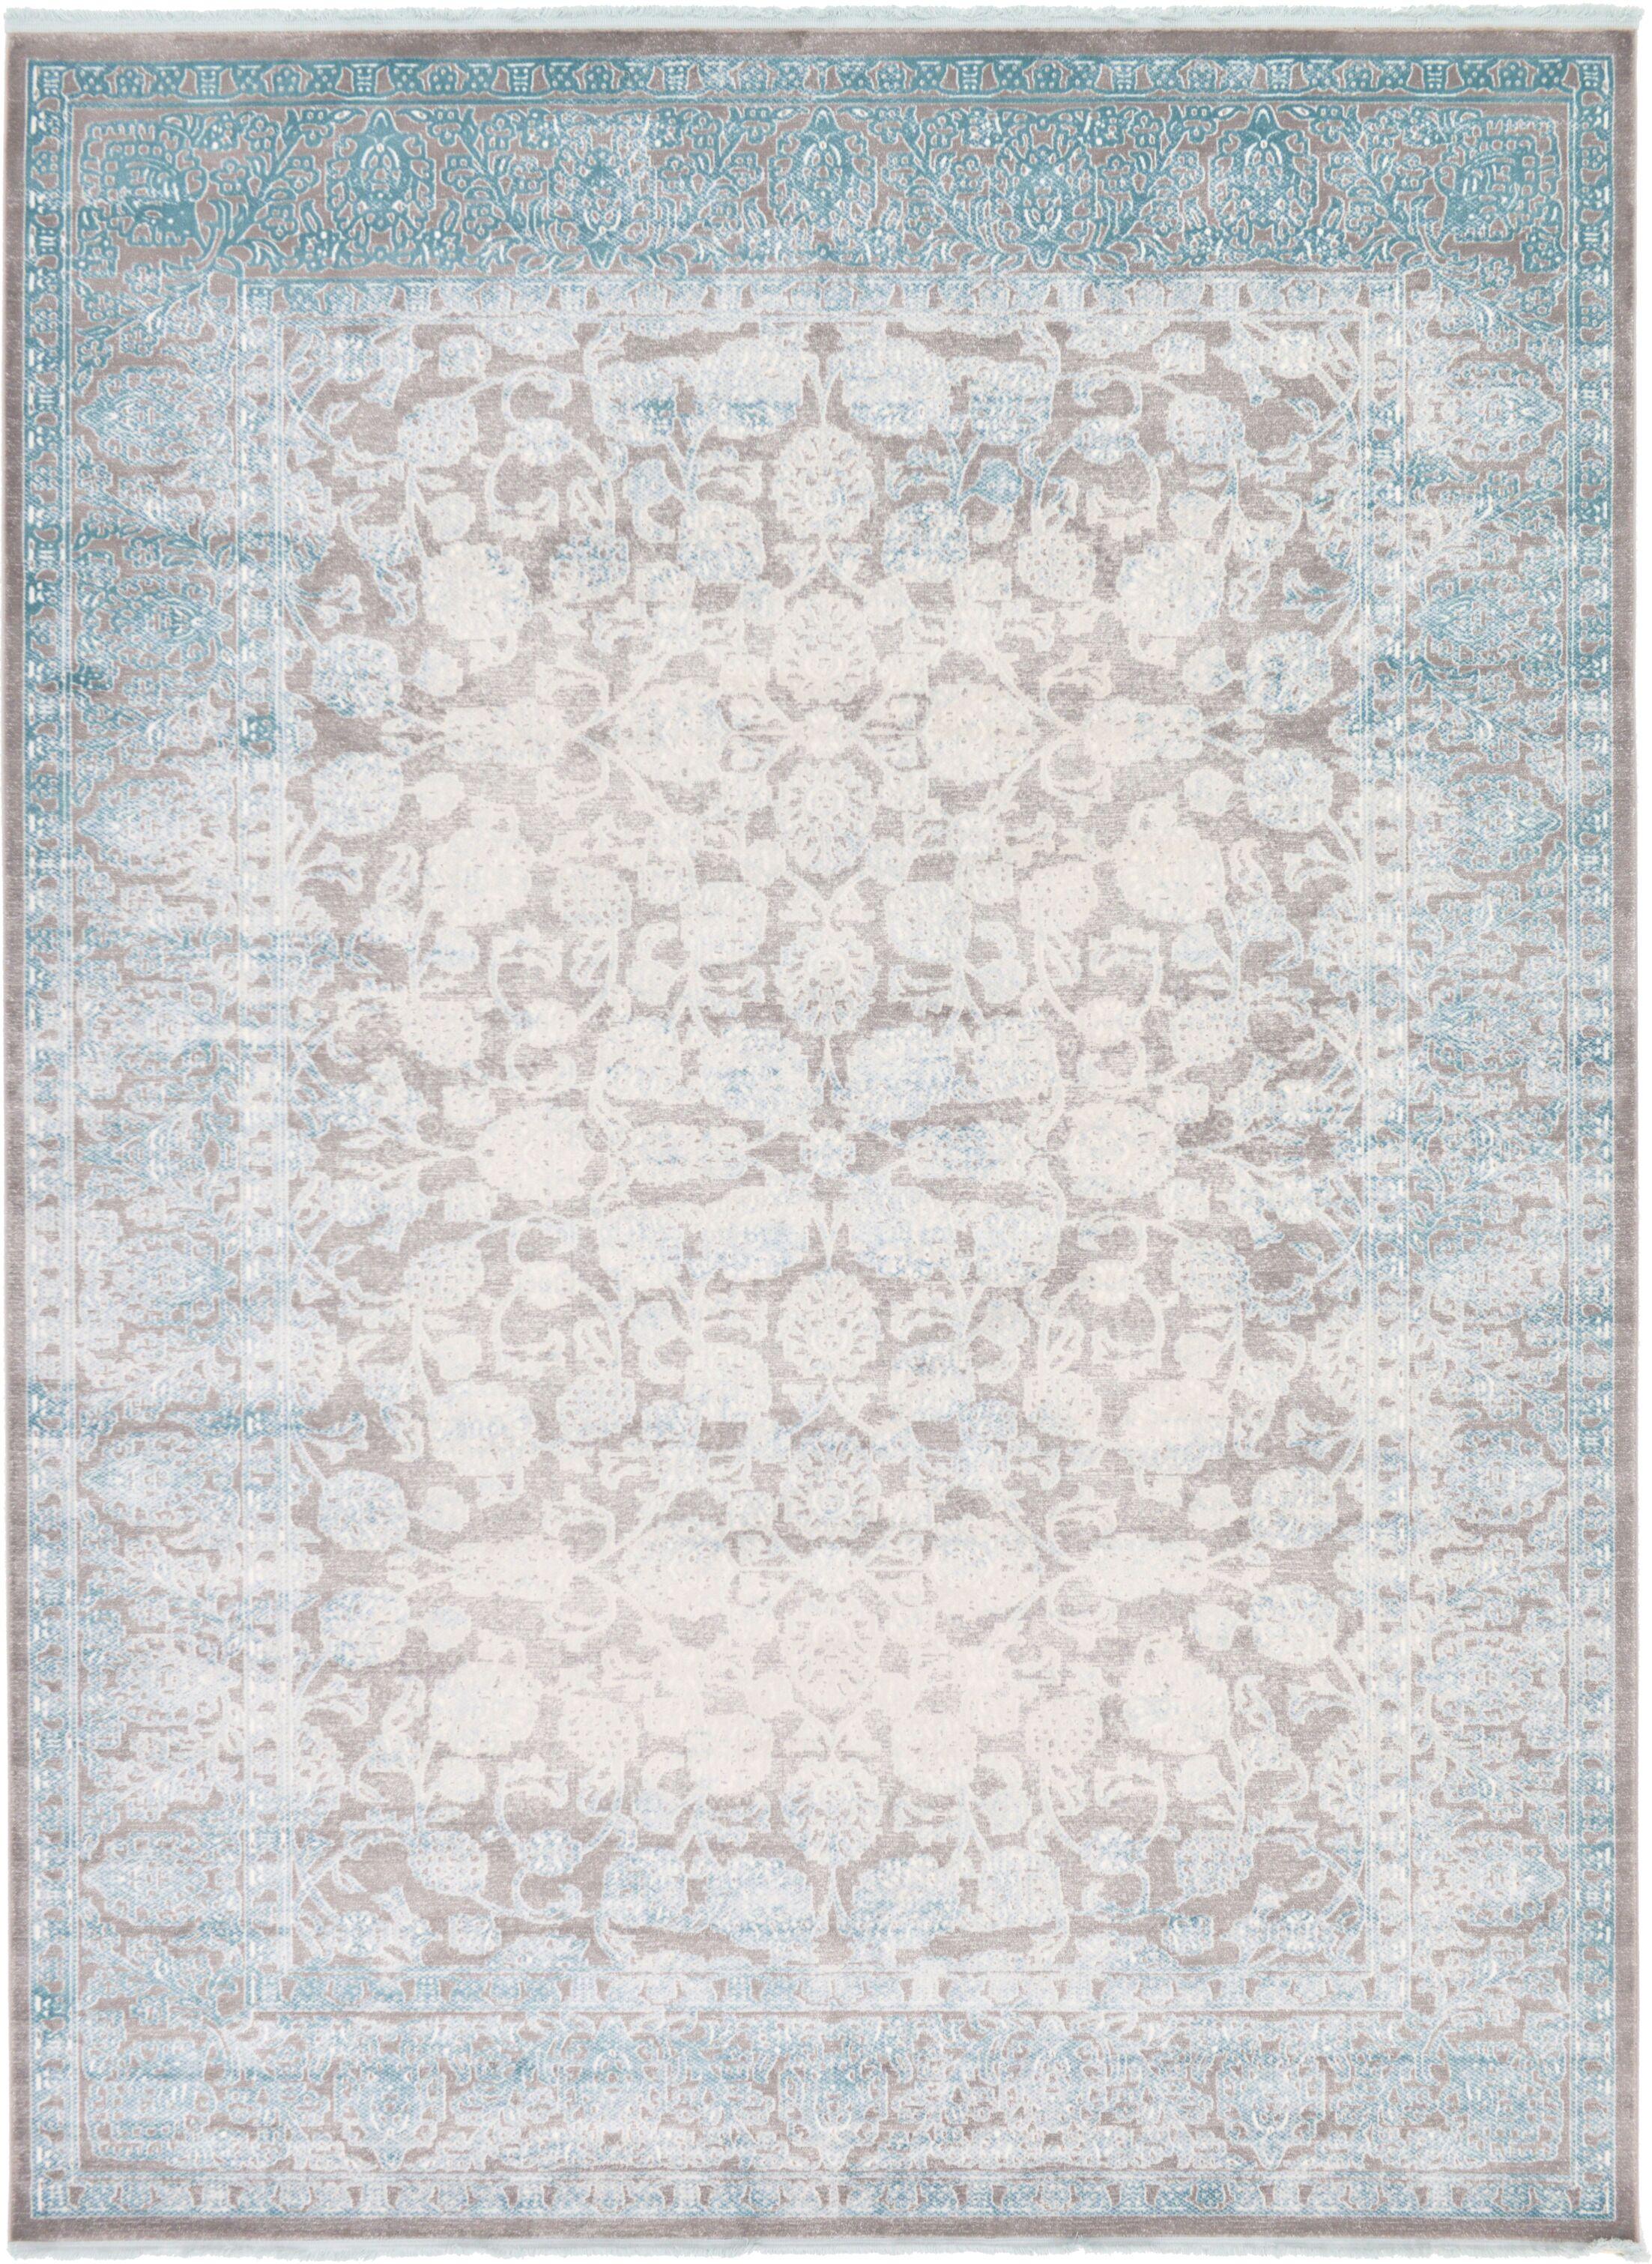 Patenaude Light Gray Oriental Area Rug Rug Size: Rectangle 9' x 12'